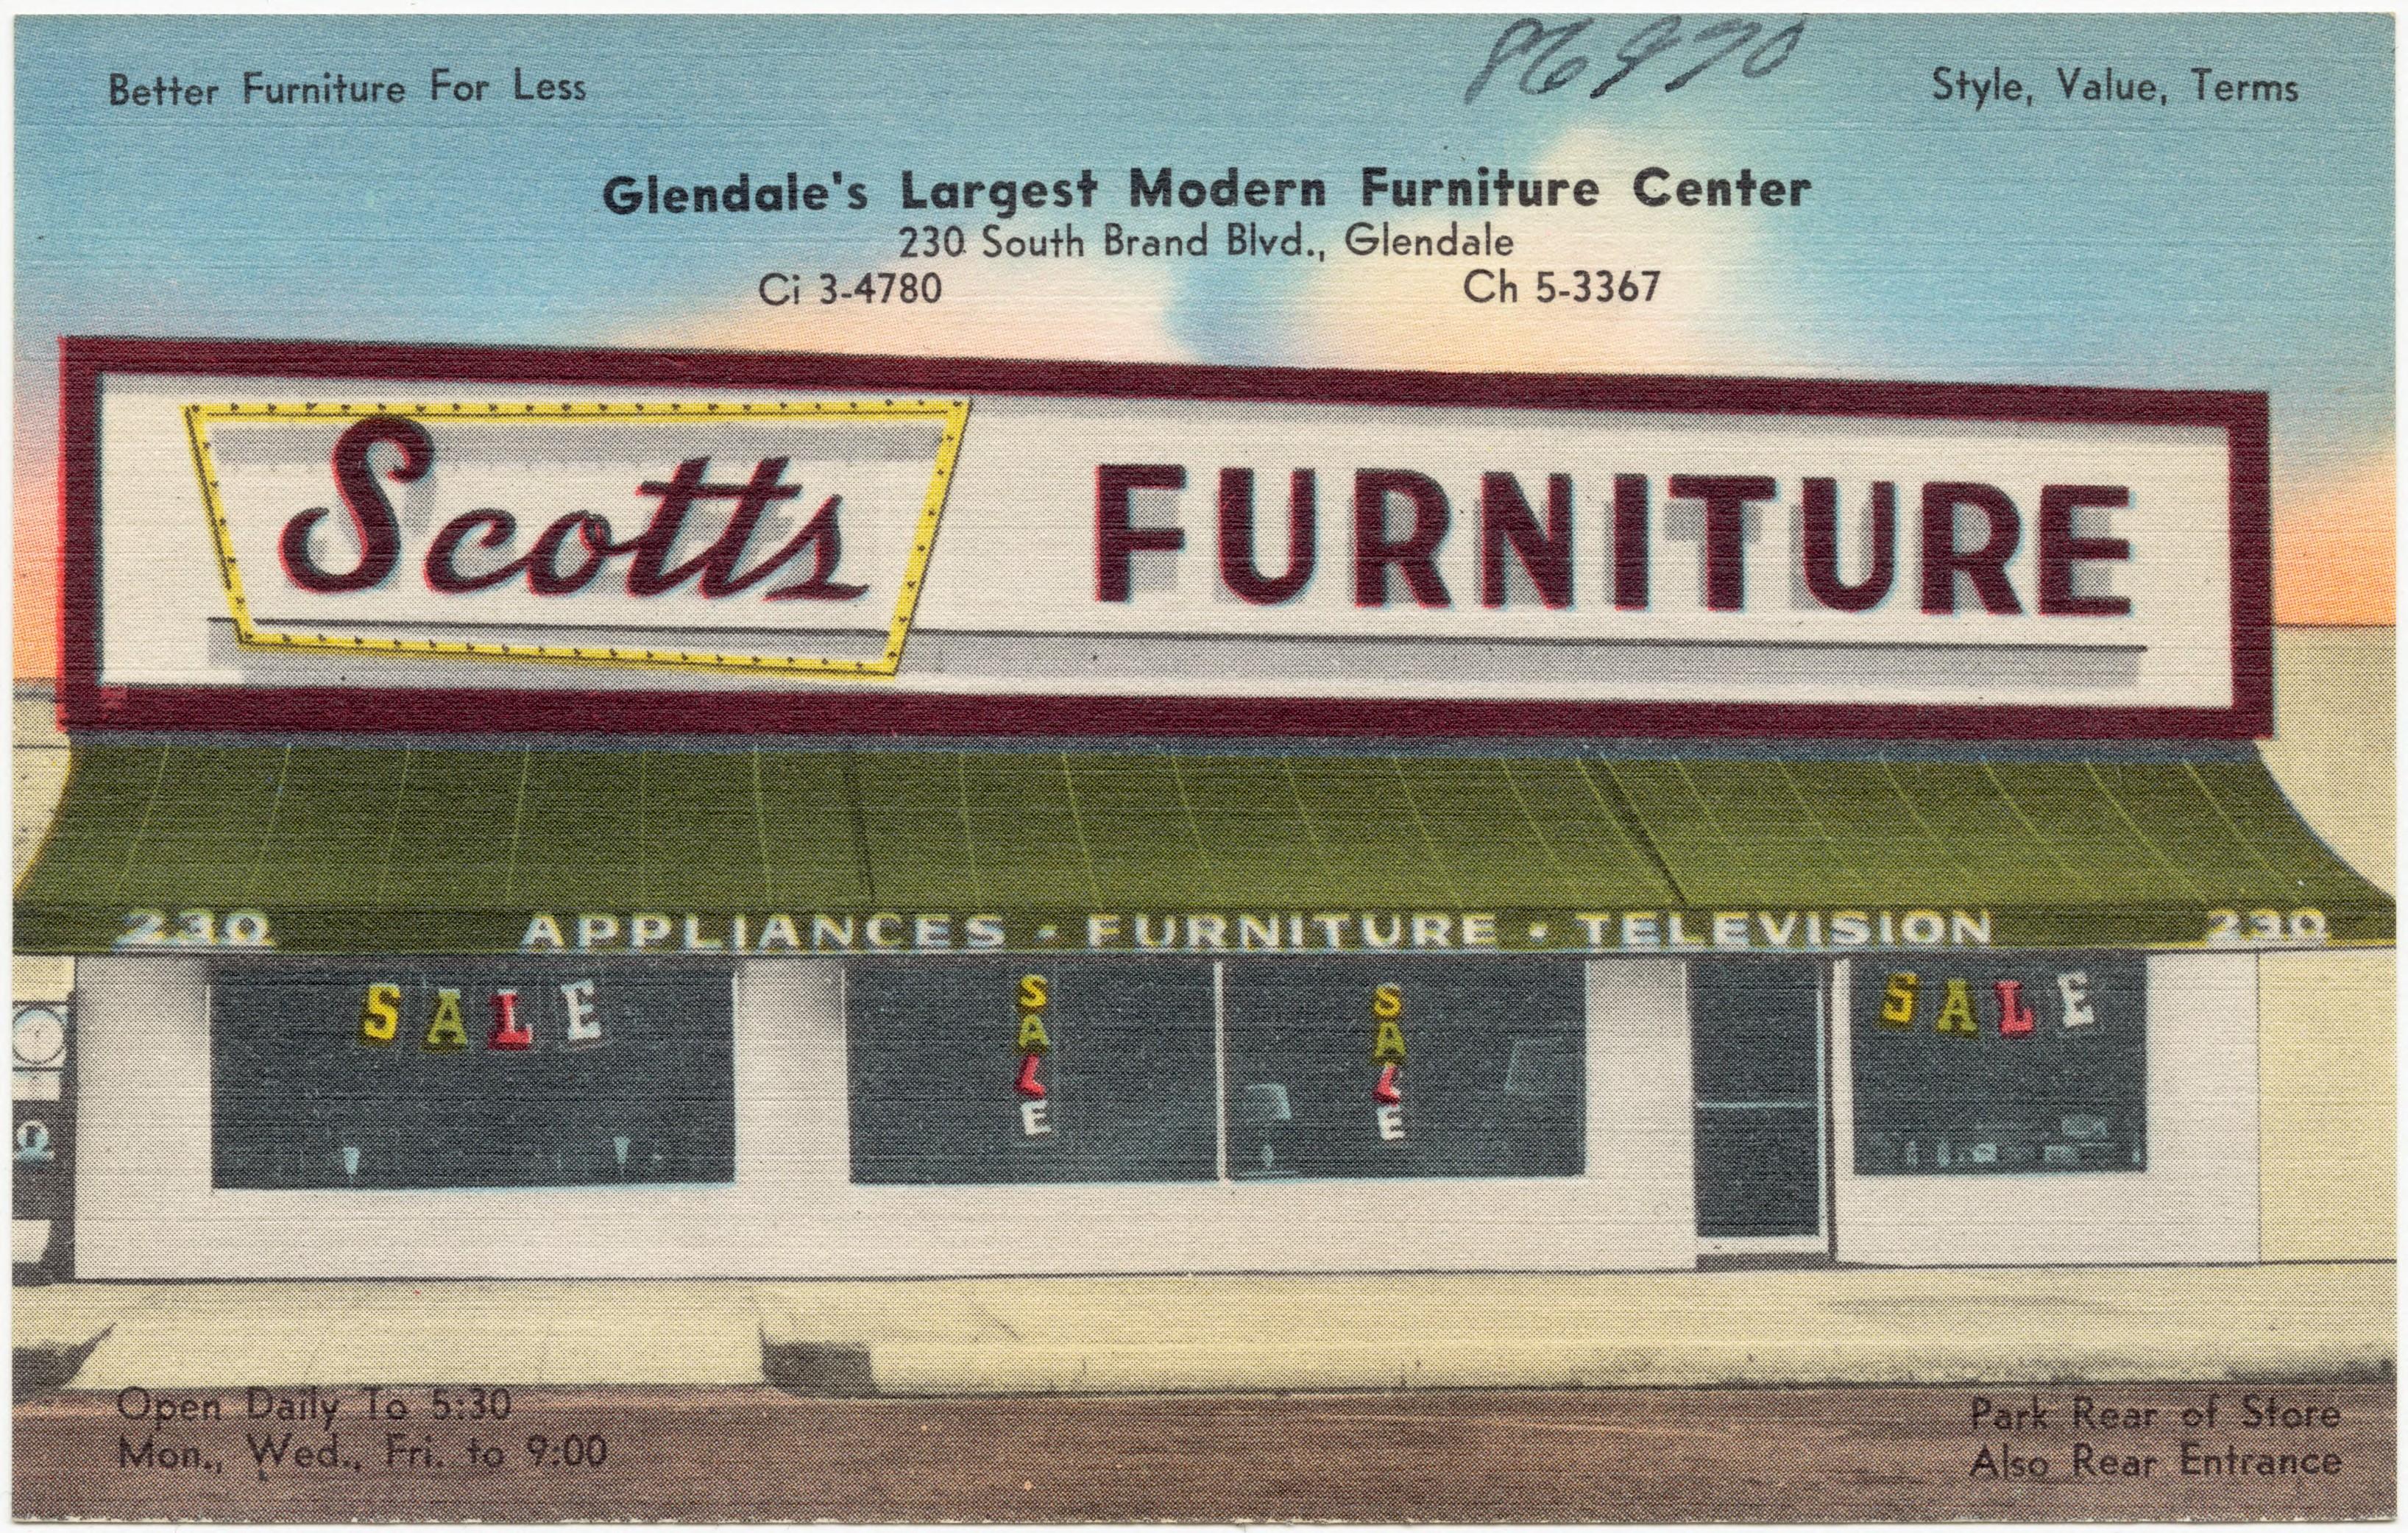 Modern Furniture Glendale file:scotts furniture, glendale's largest modern furniture center